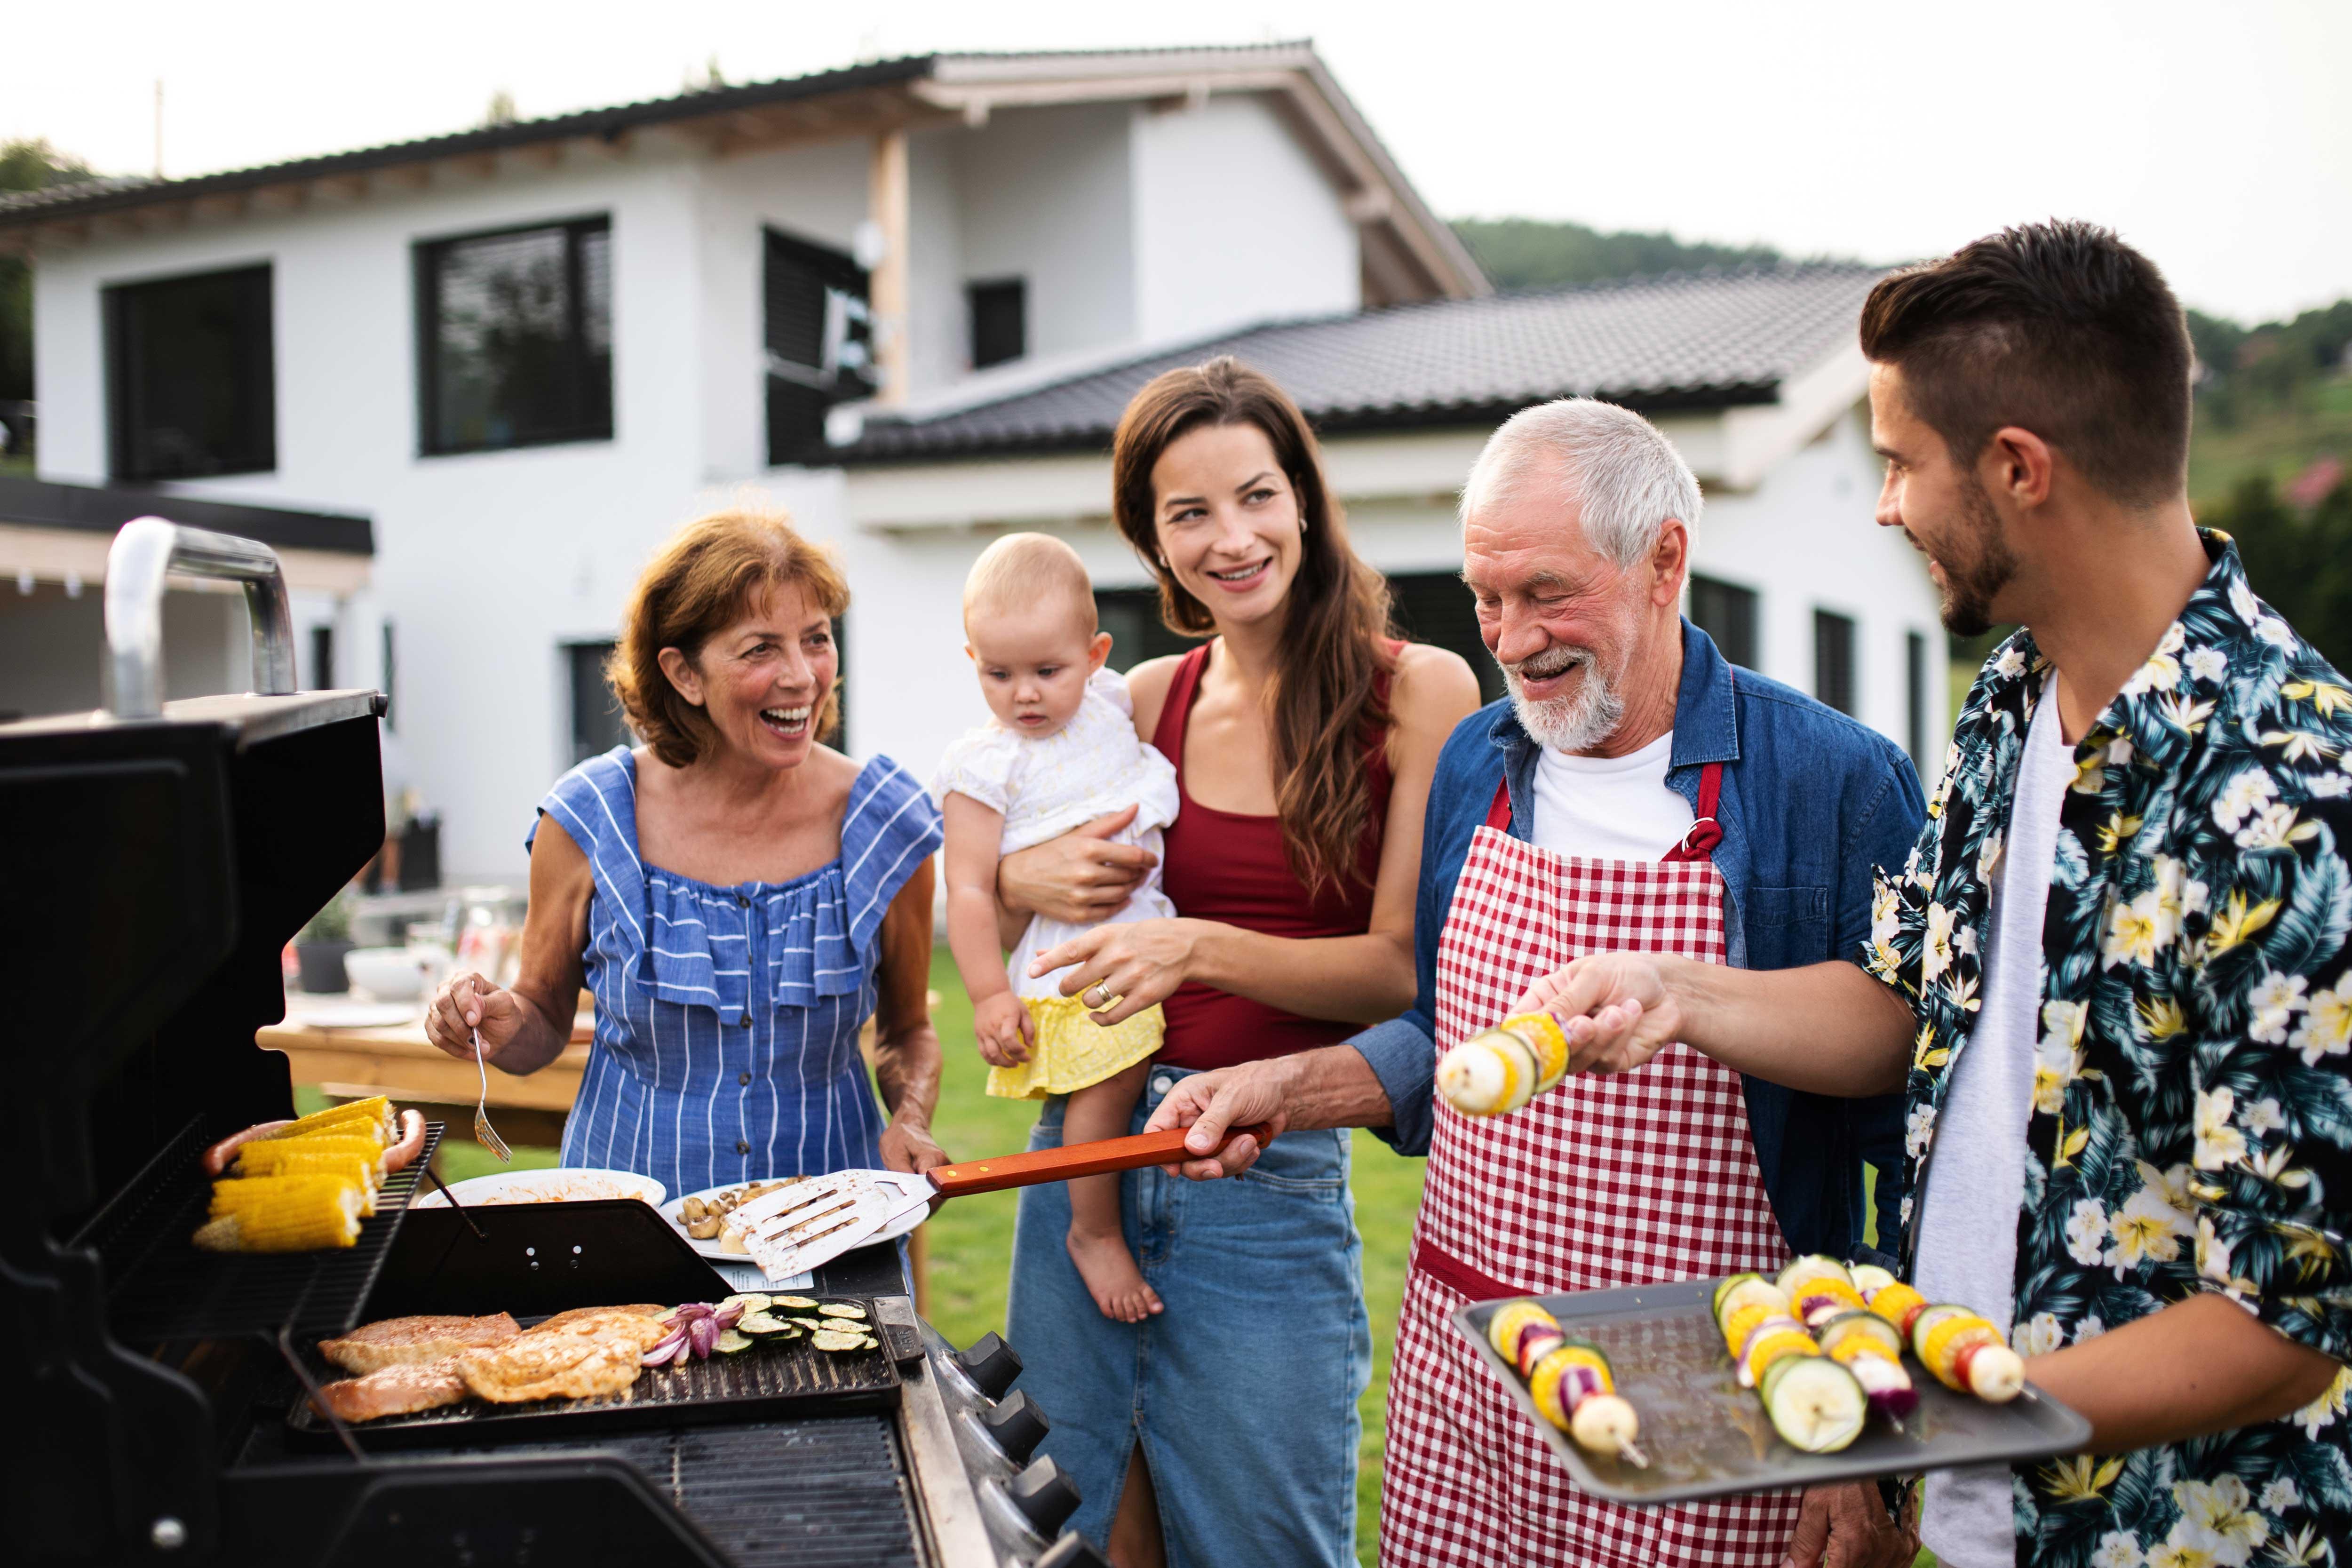 Multigenerational family enjoying BBQ in a backyard